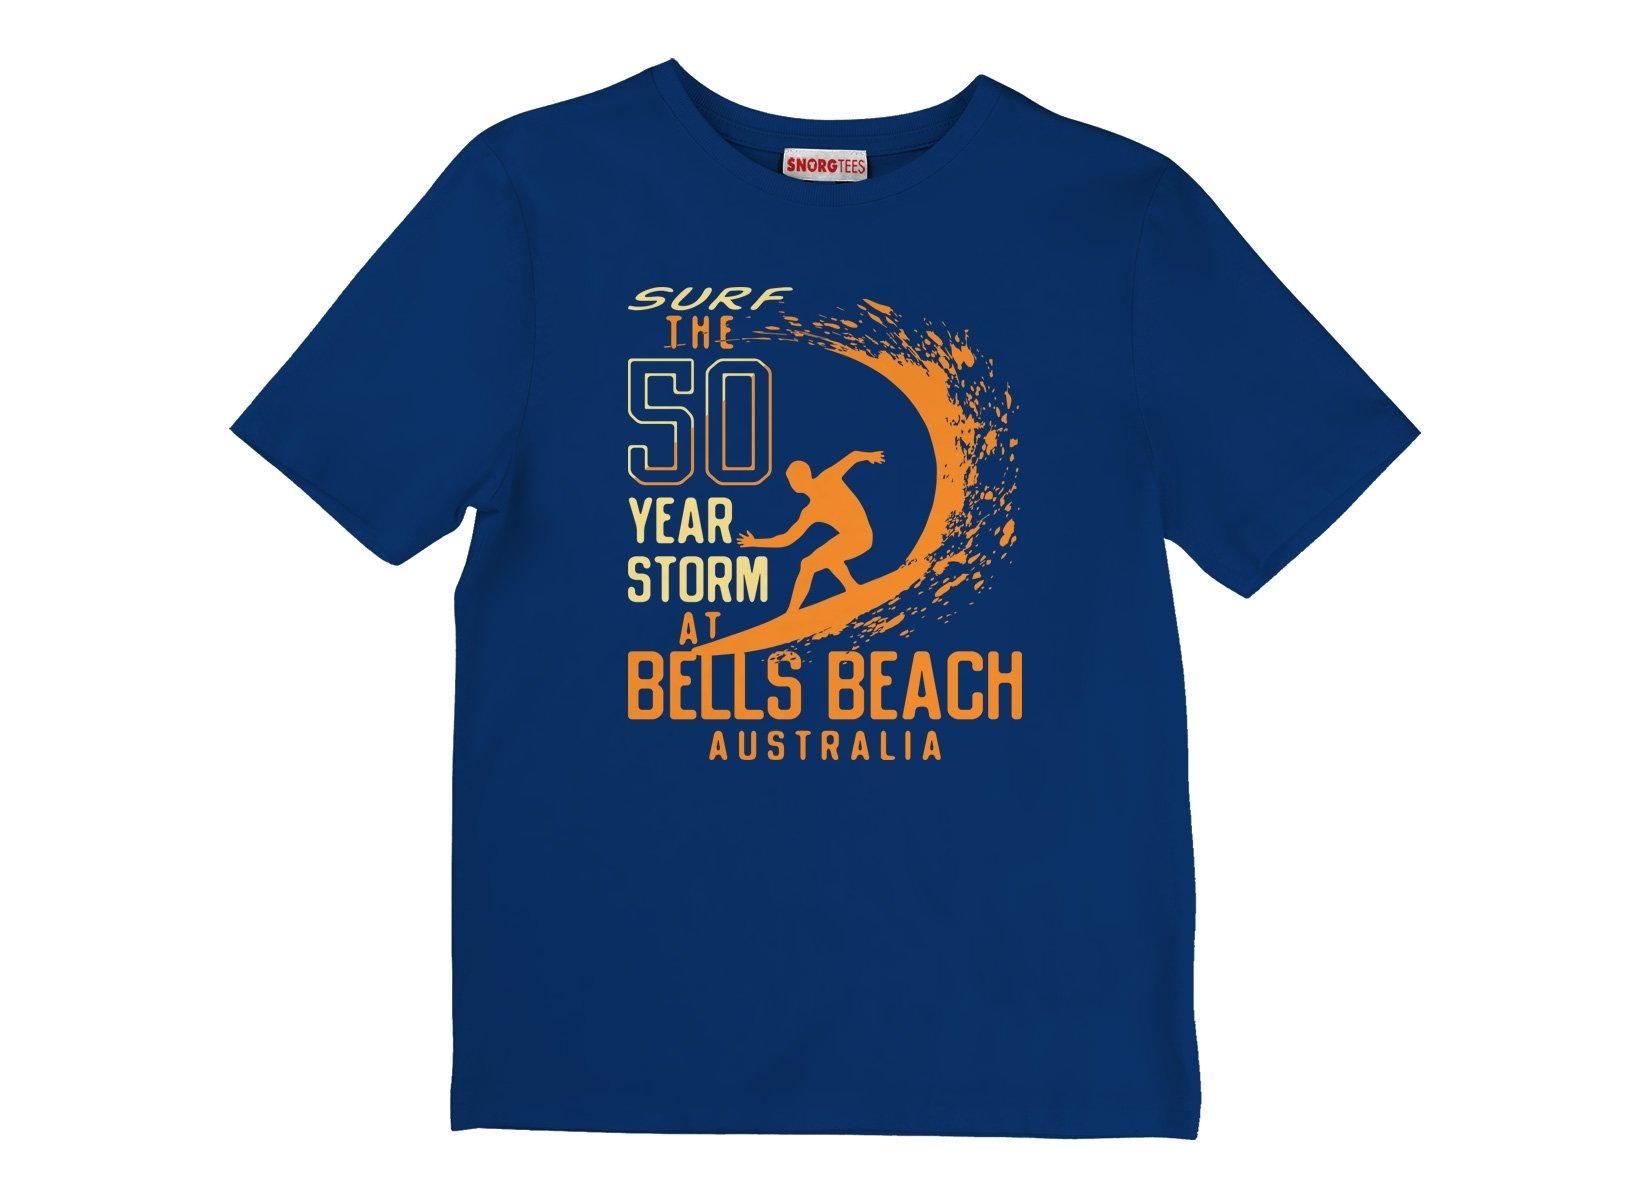 50 Year Storm At Bells Beach on Kids T-Shirt